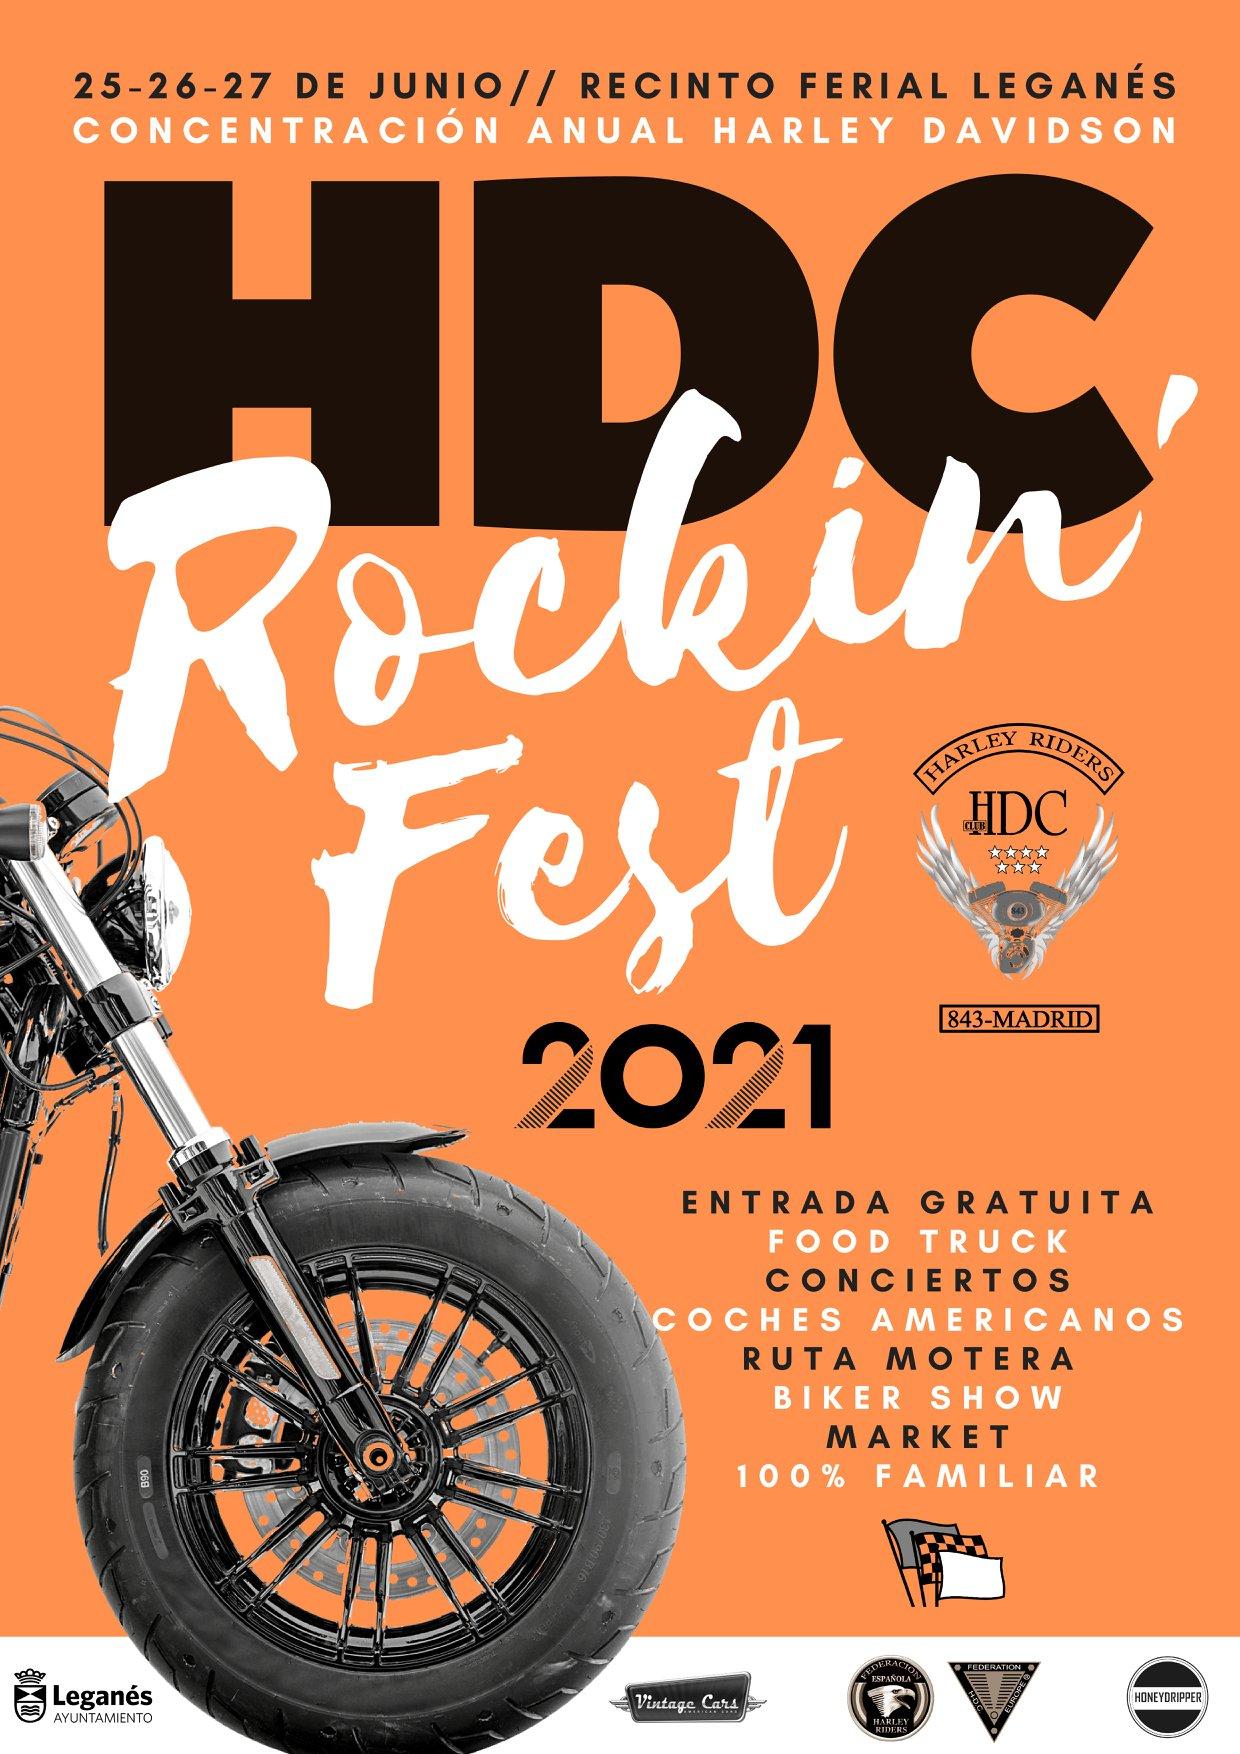 HDC Rockin Fest 2021